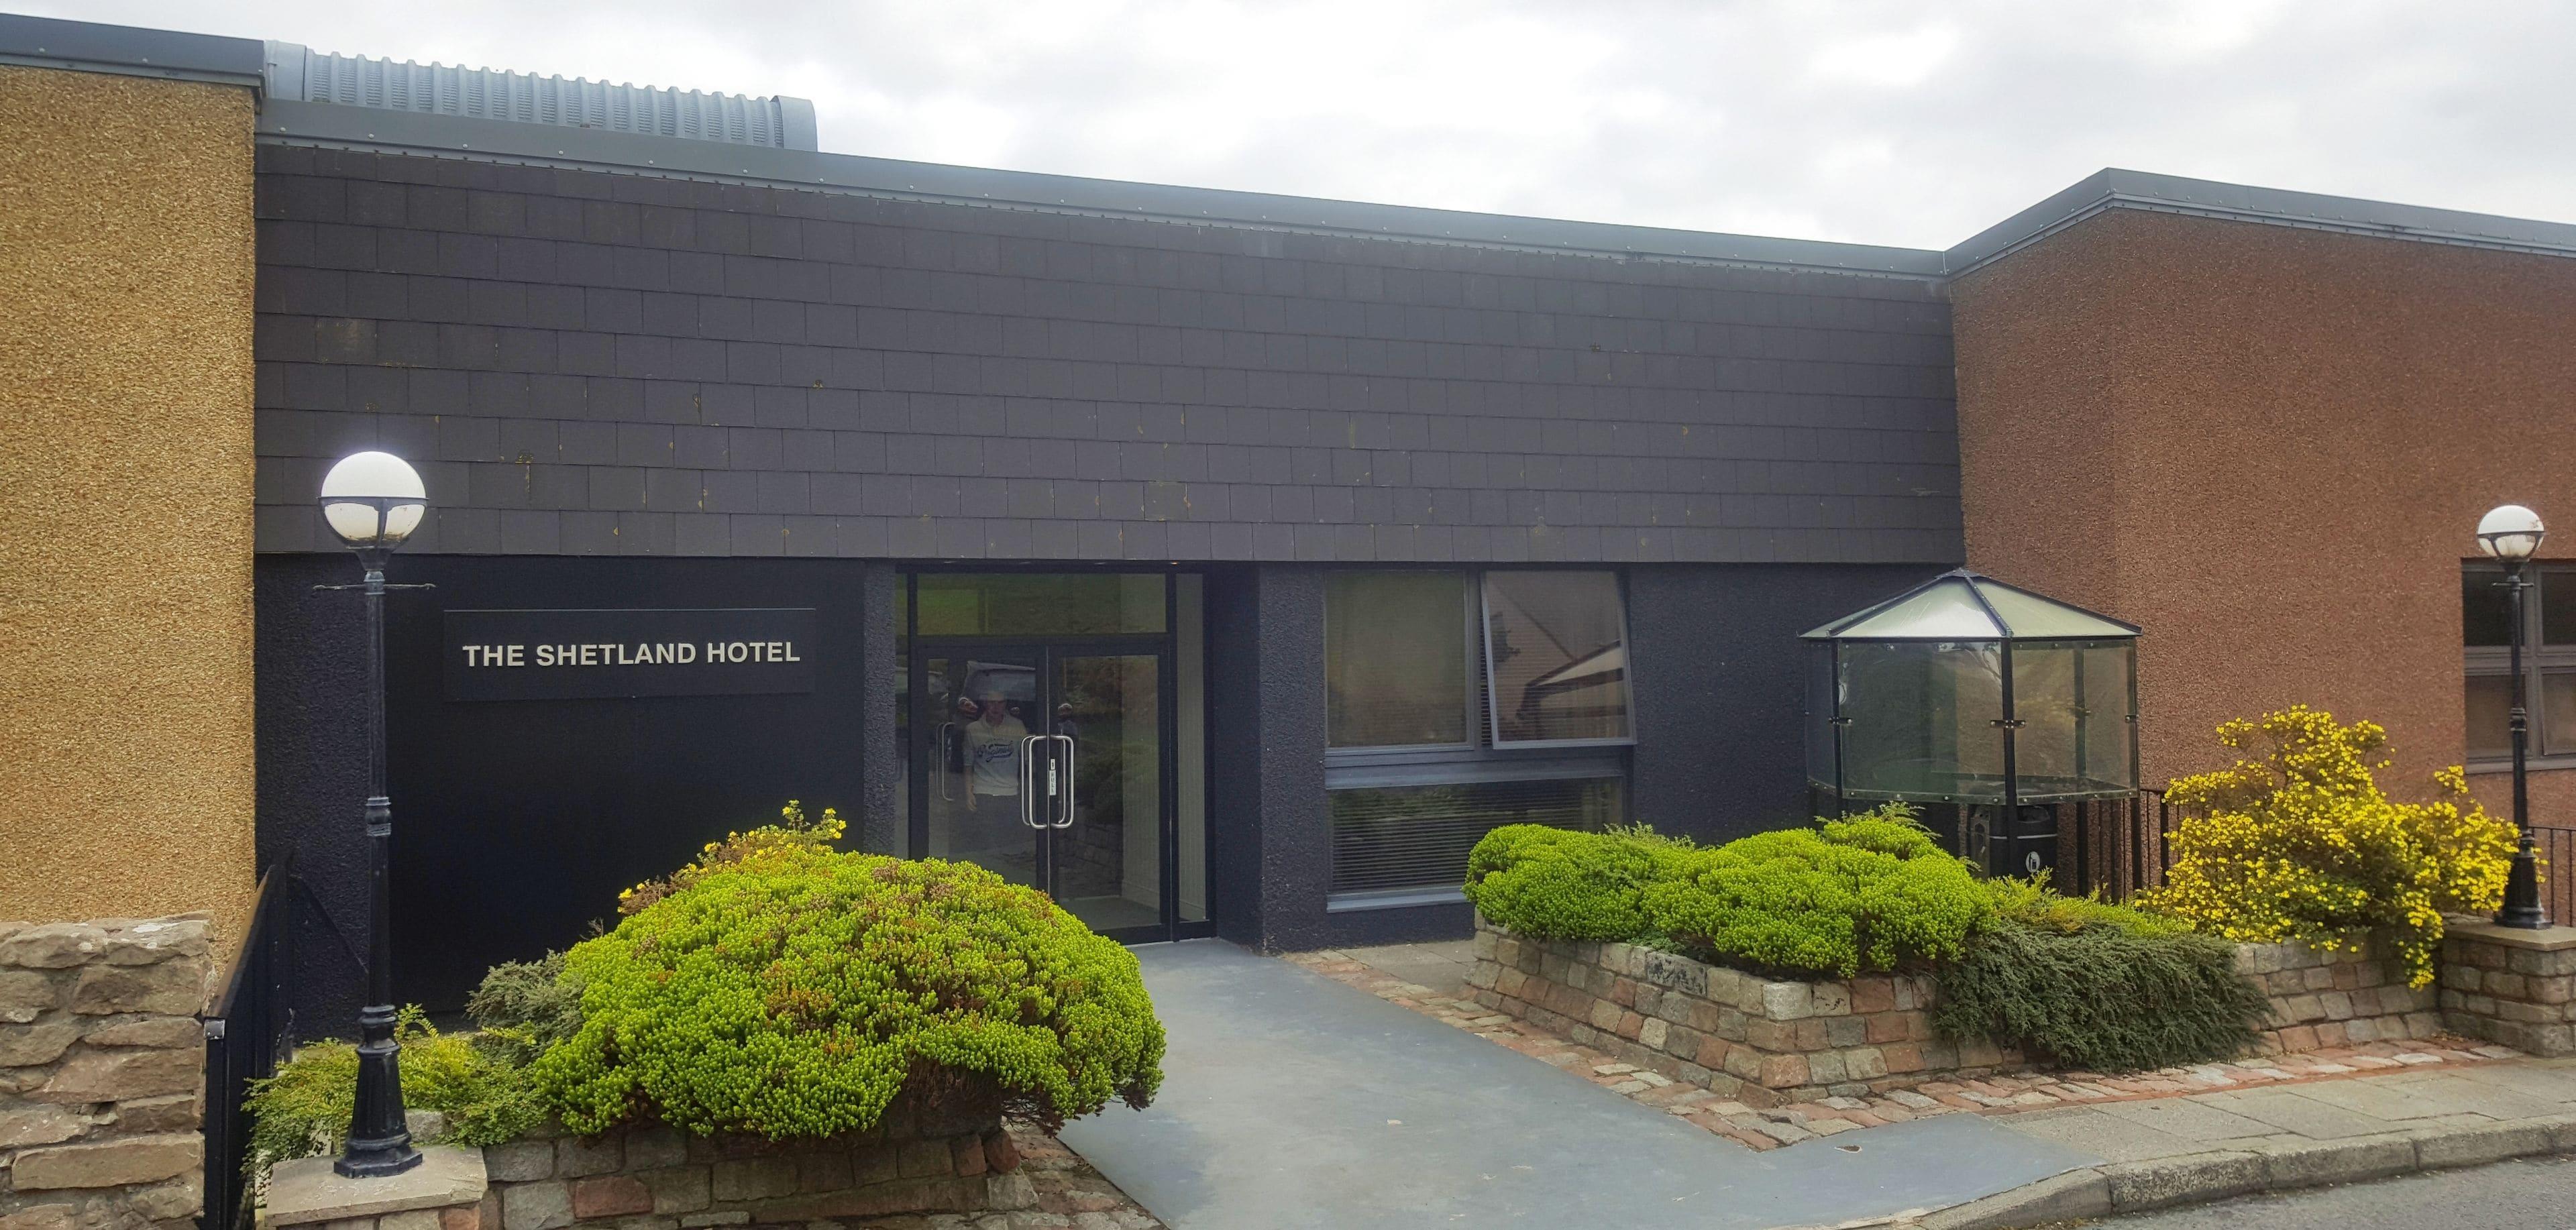 WATERFRONT BAR & GRILL, Lerwick Omdömen om restauranger